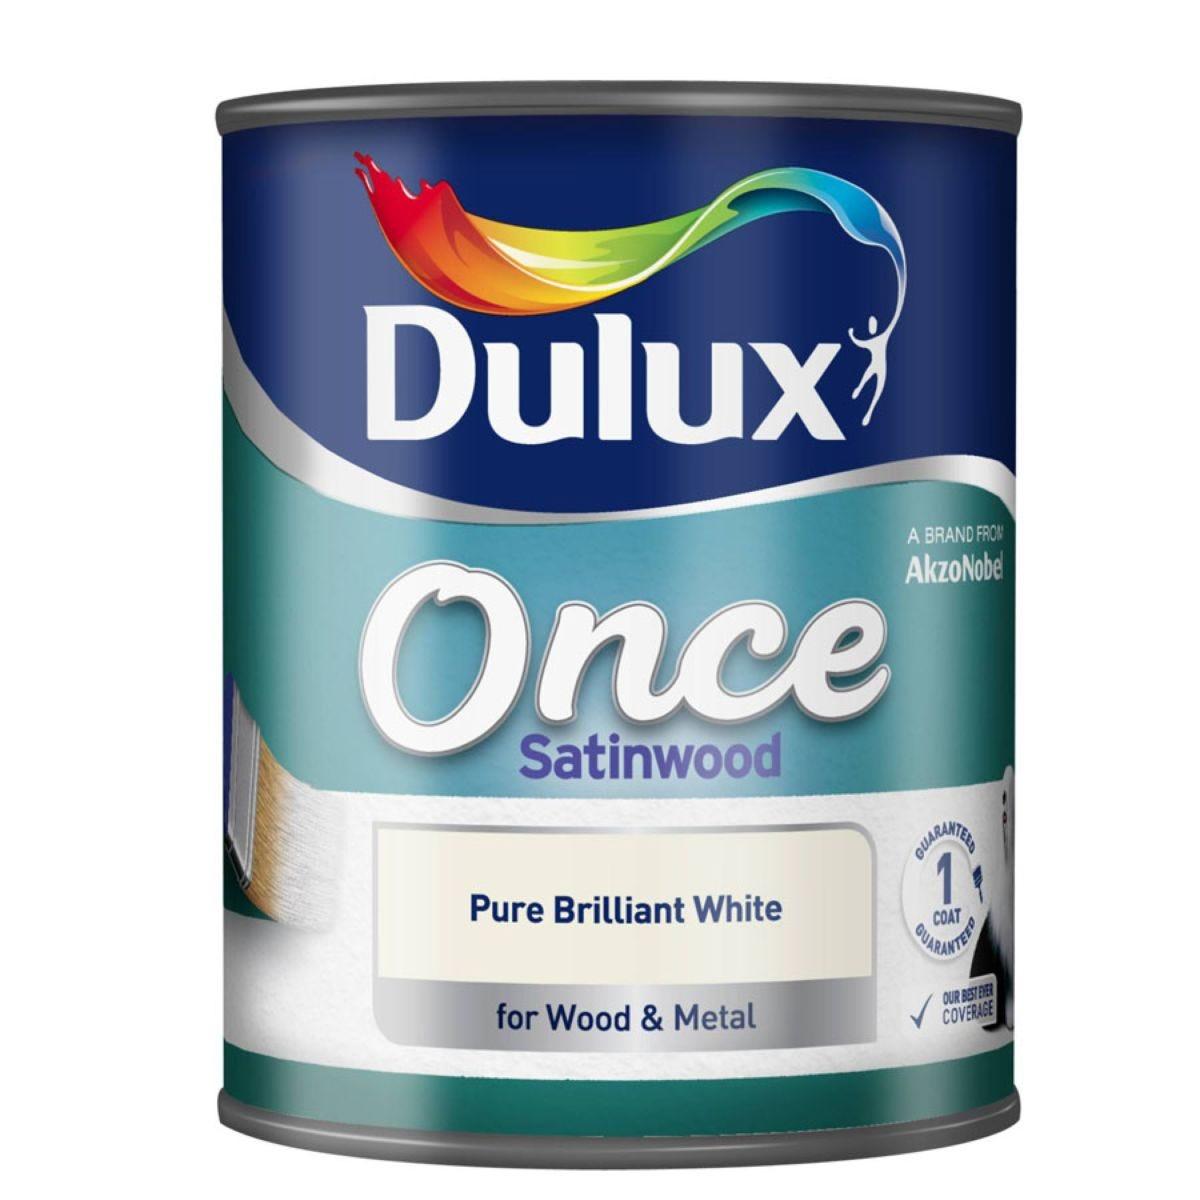 Dulux Once Satinwood Wood & Metal Paint – Brilliant White, 750ml